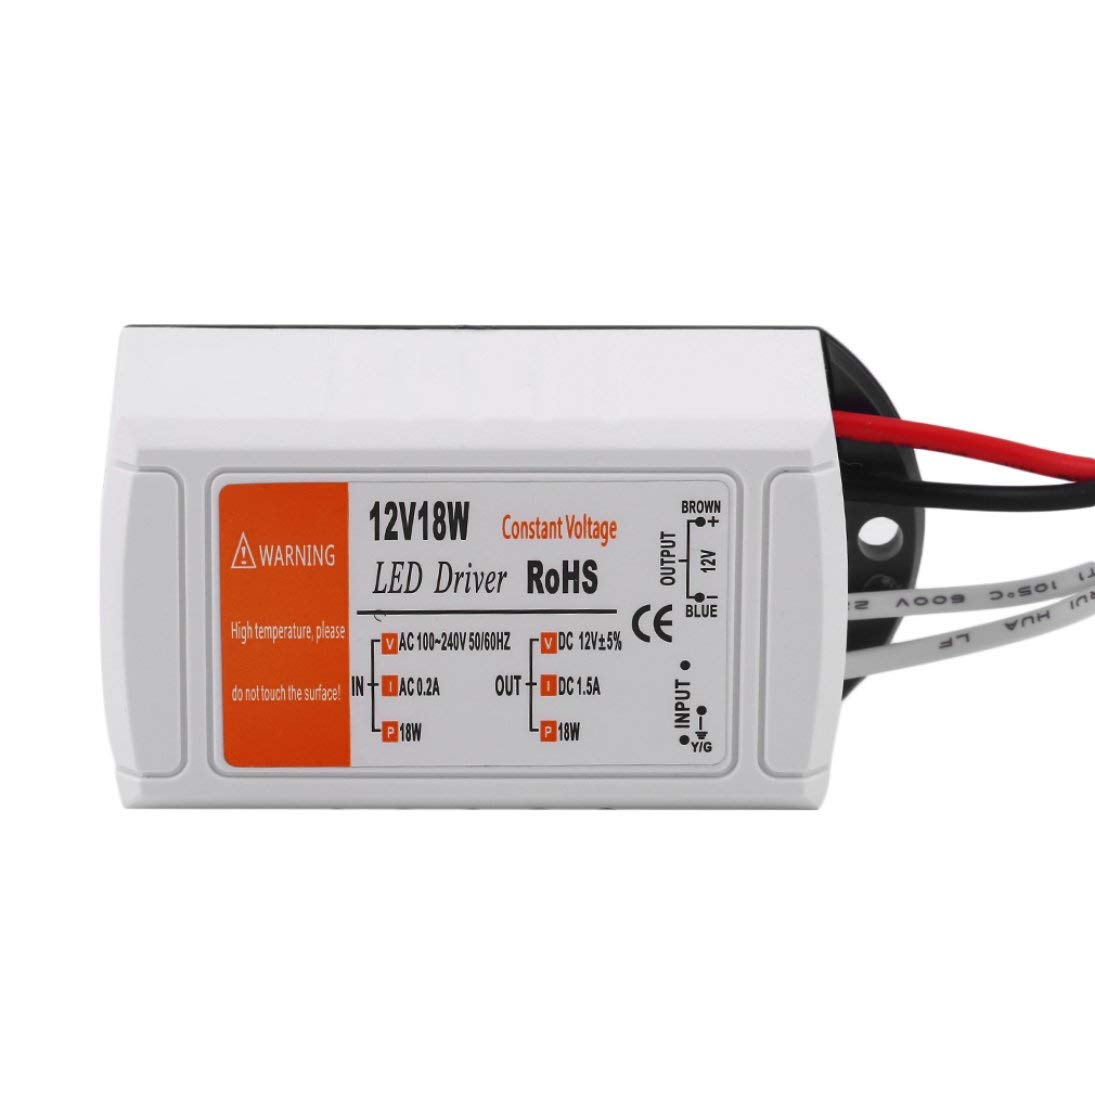 28W 100W 48W Trasformatore per trasformatore adattatore per driver 12v LED CC da 18W 72W